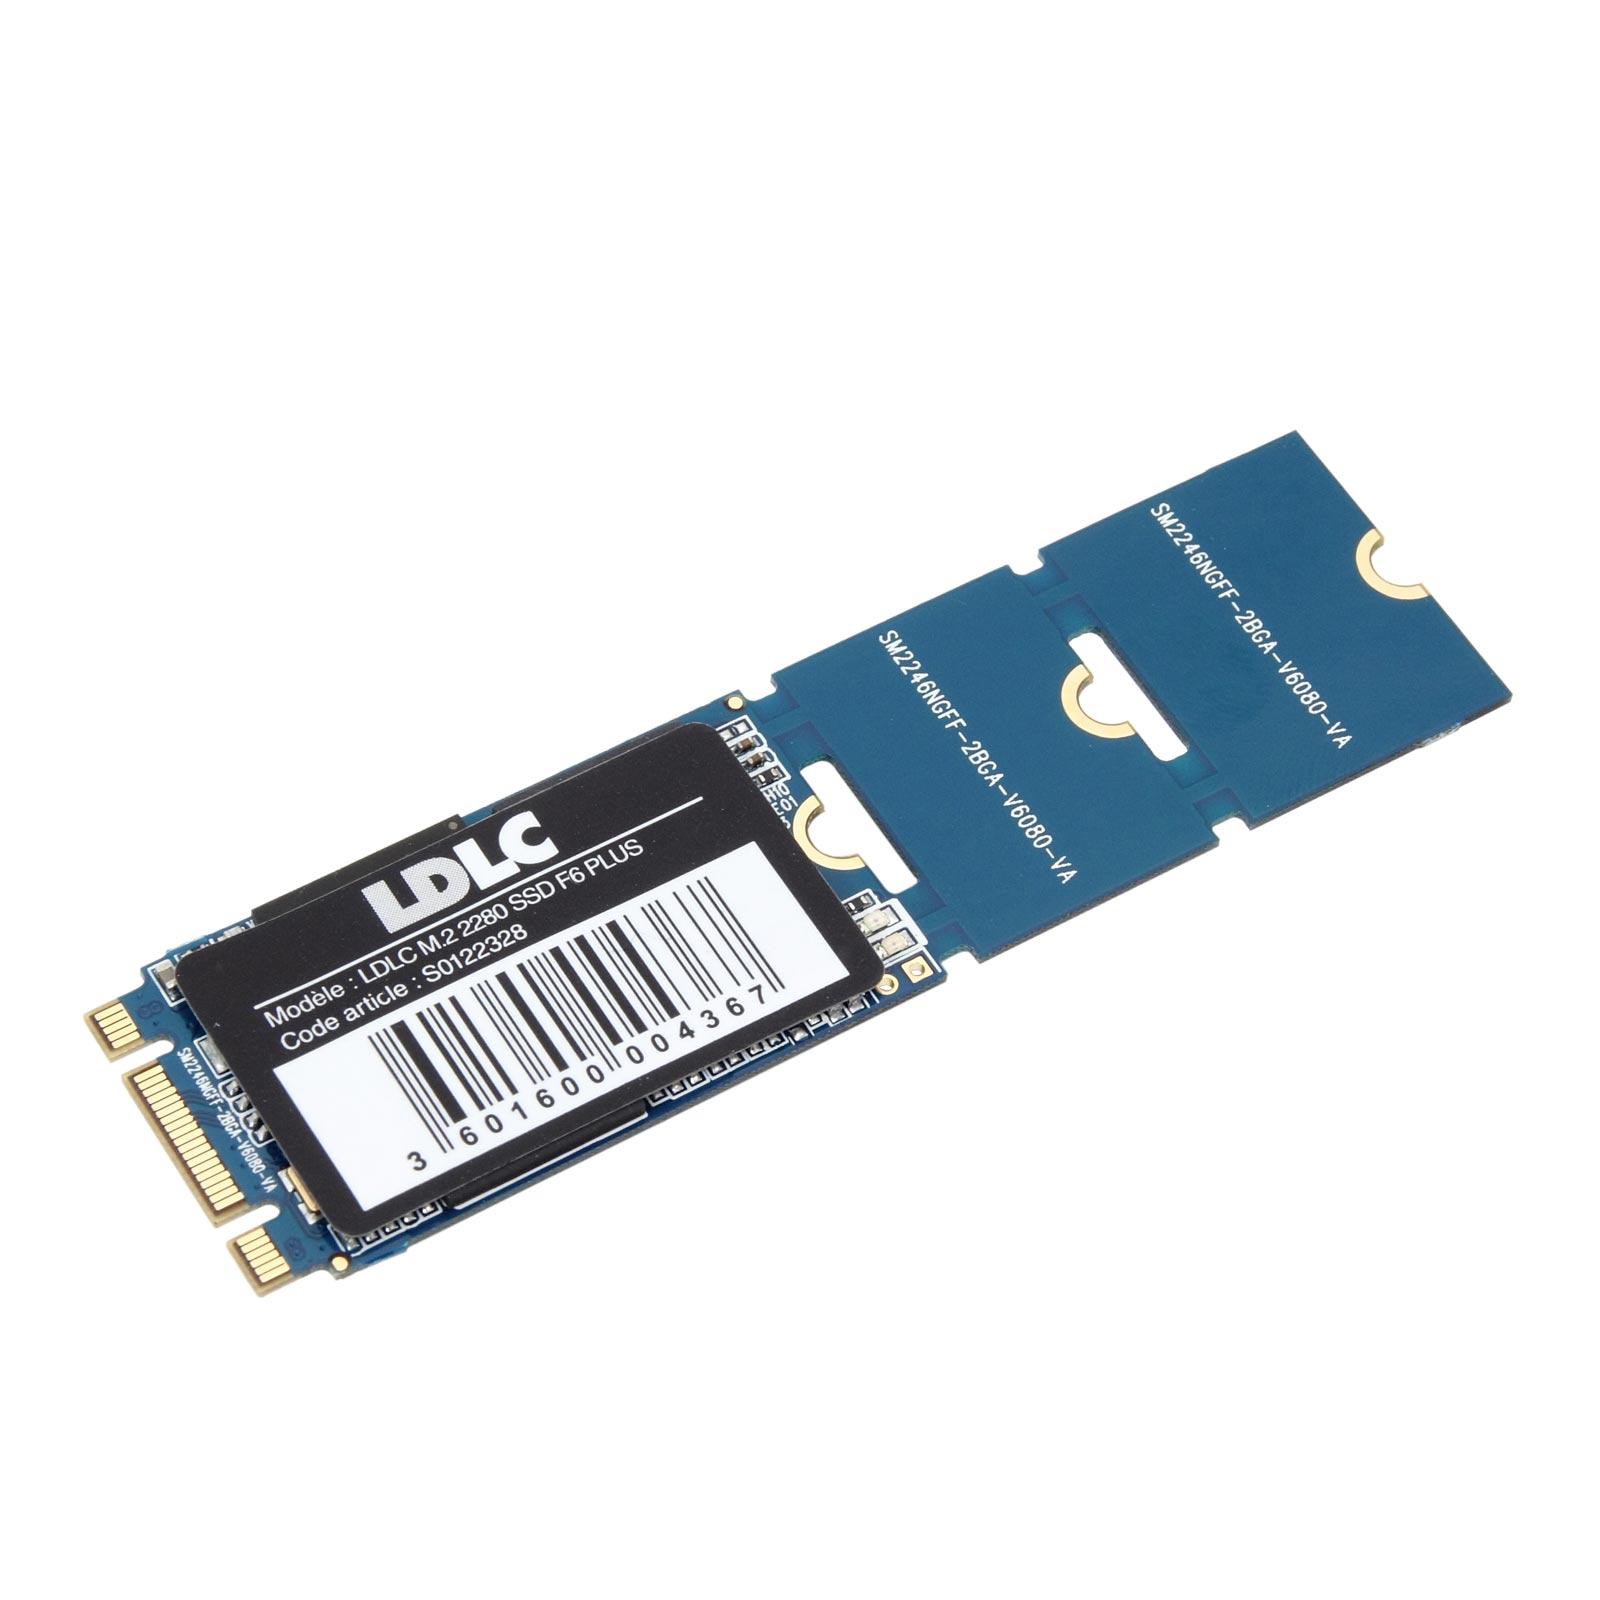 Disque SSD LDLC SSD M.2 2280 F6 PLUS 240 GB SSD 240 Go M.2 2280 SATA 6 Gbps